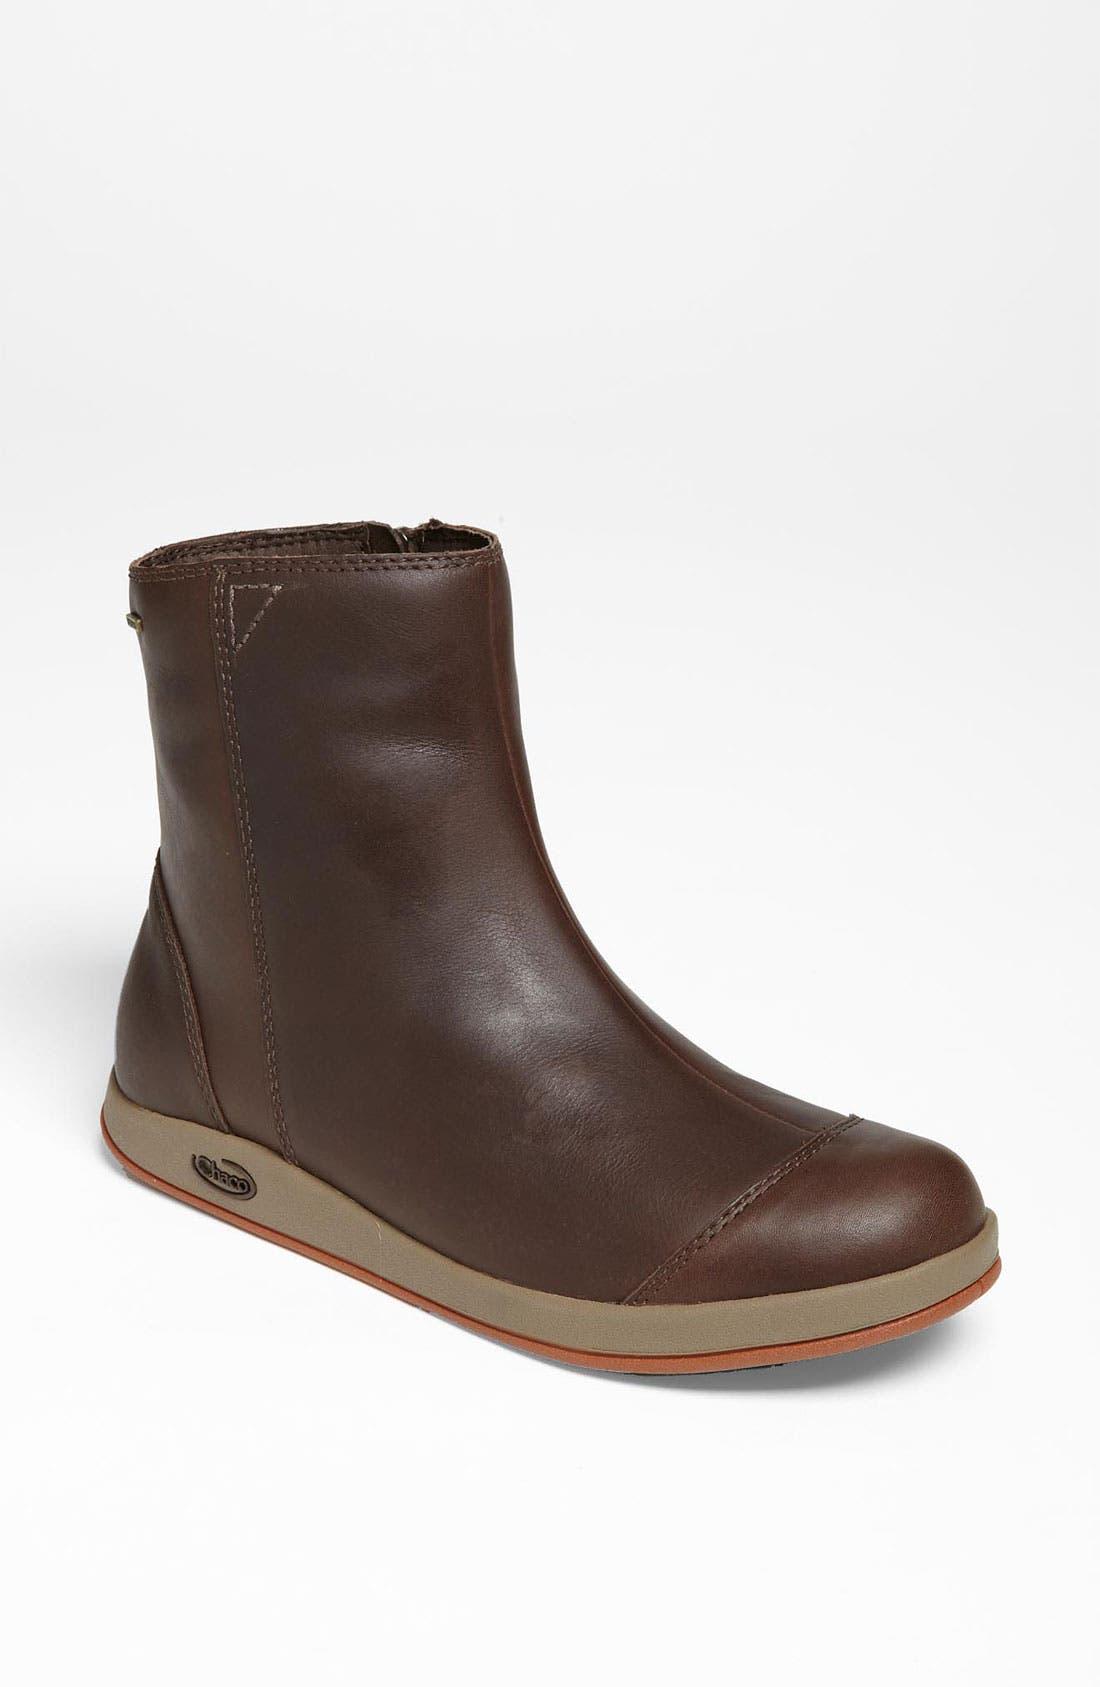 Main Image - Chaco 'Darcy' Boot